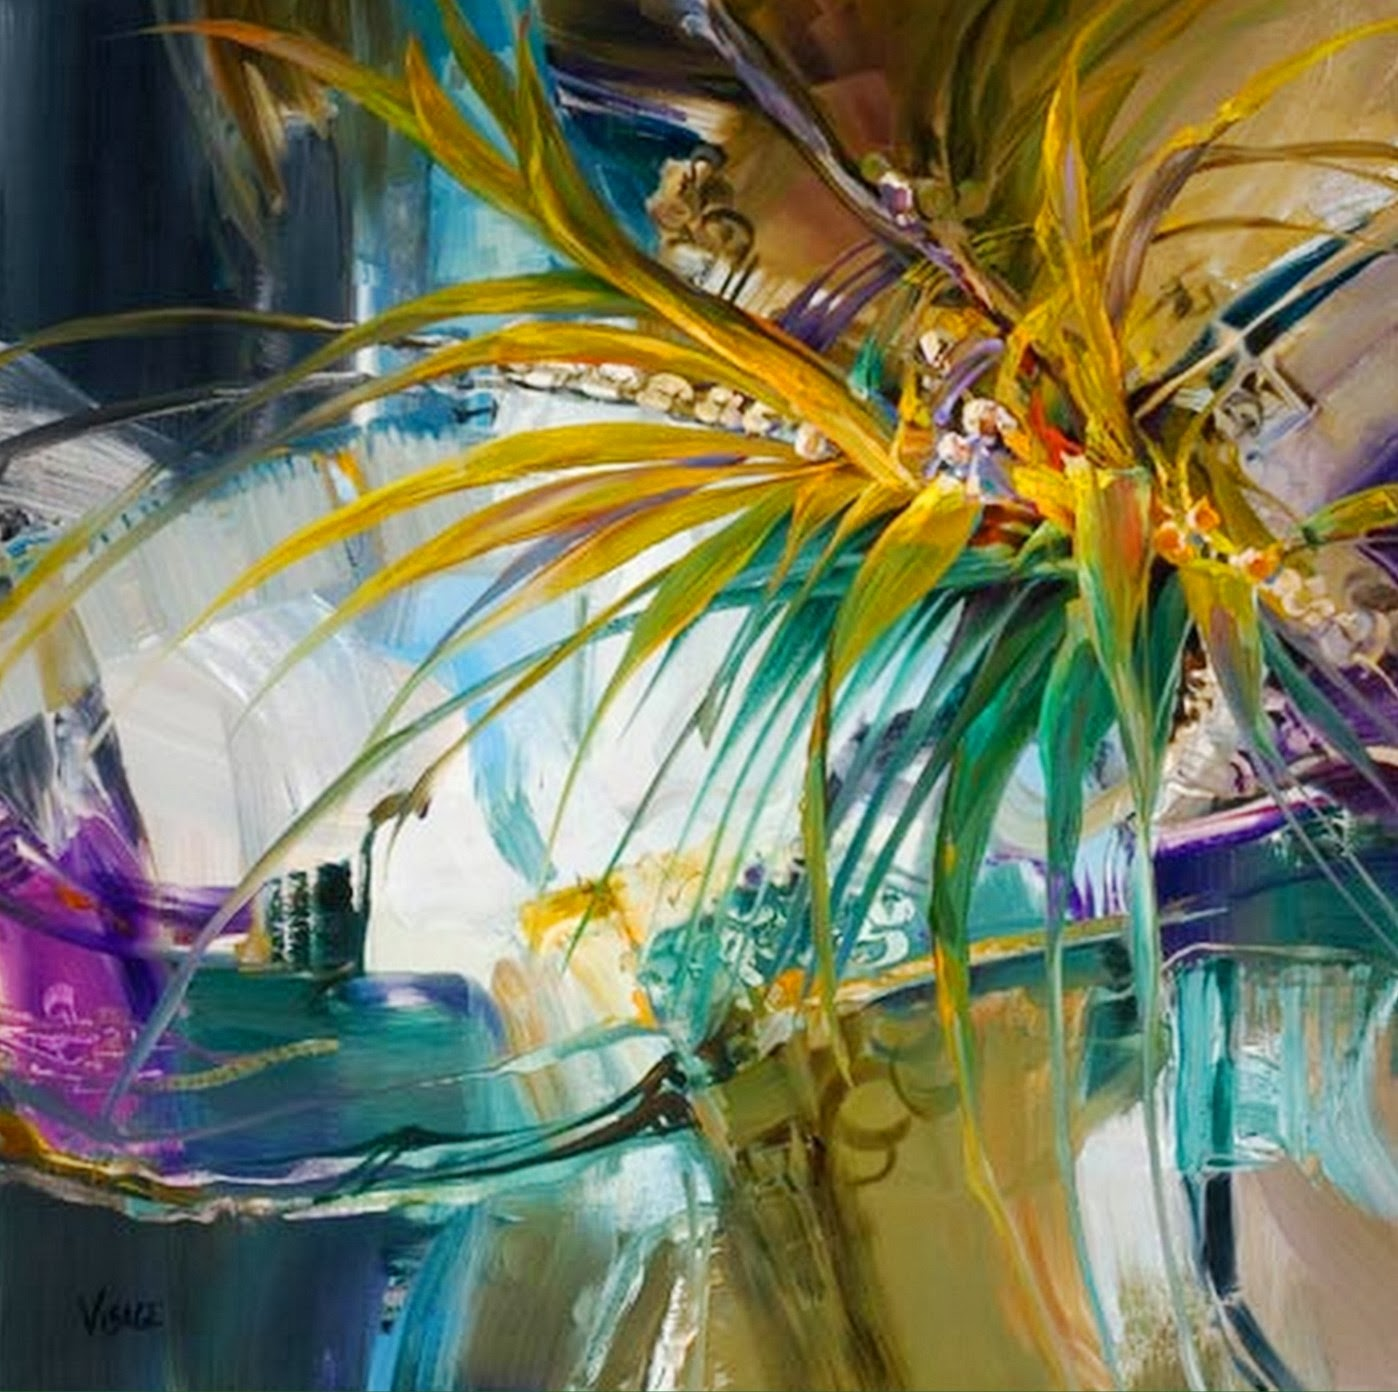 Pintura moderna y fotograf a art stica pintura abstracta - Cuadros modernos con mucho color ...